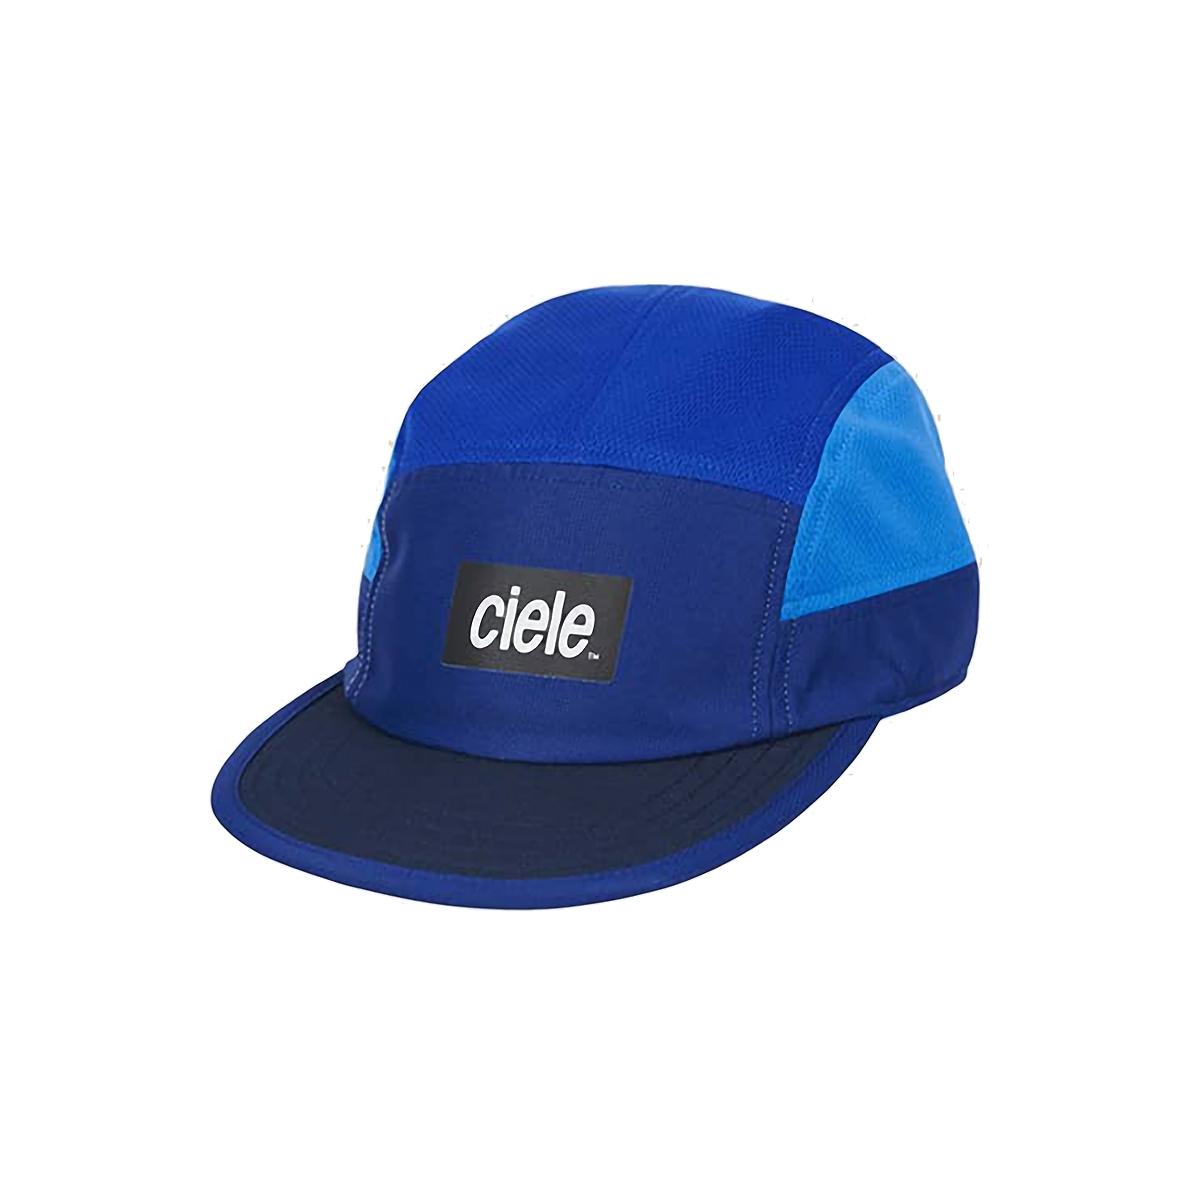 Ciele Athletics GoCap Standard Hat - Color: Indigo, Indigo, large, image 1